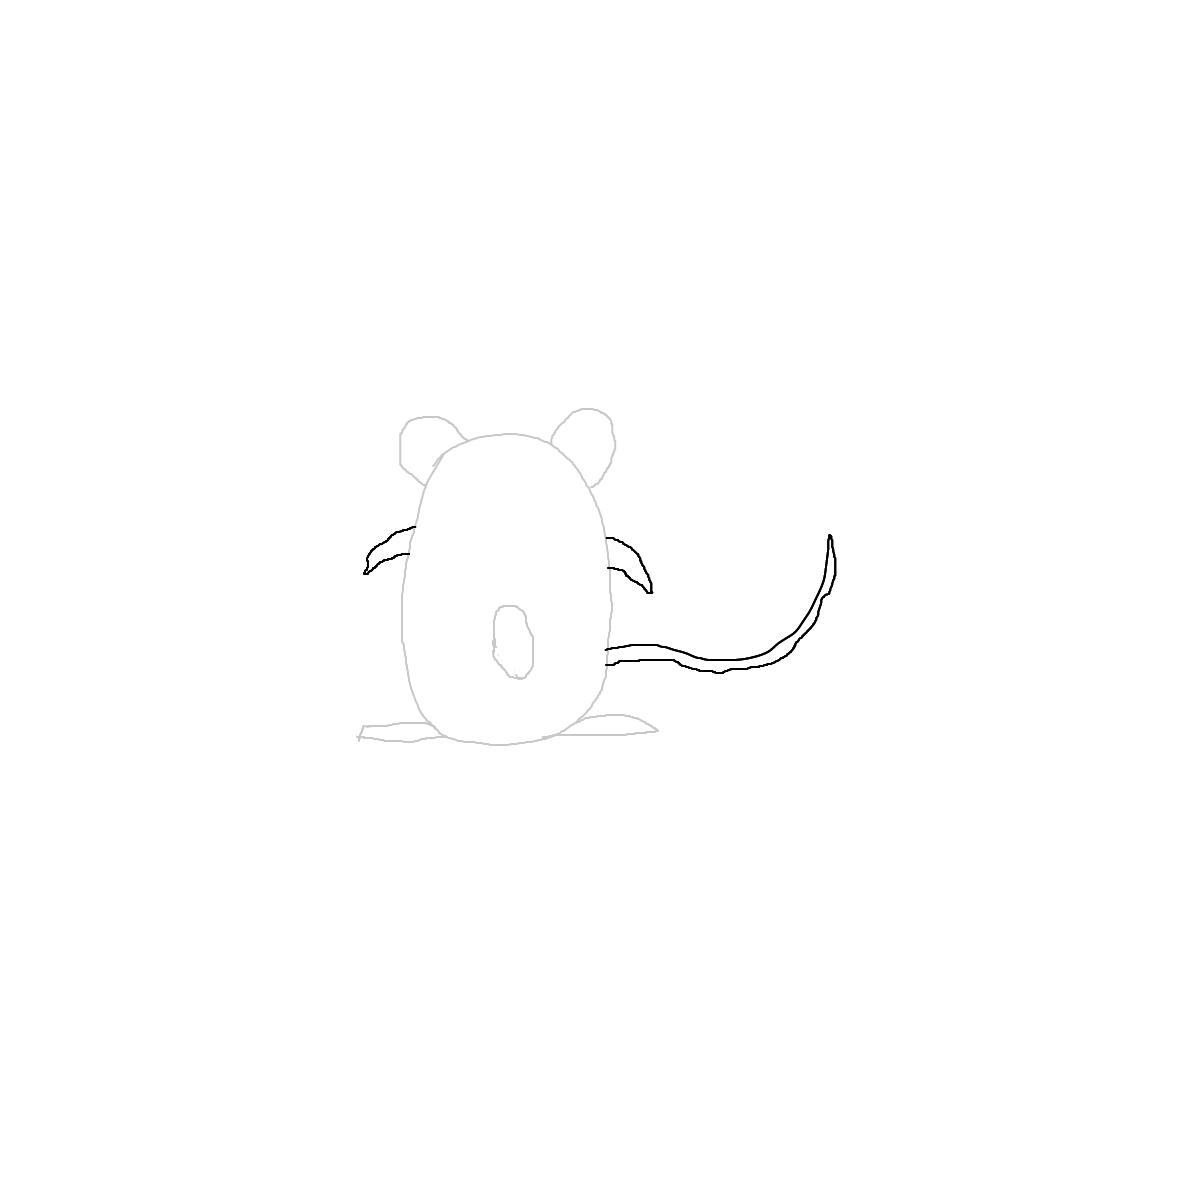 BAAAM drawing#16950 lat:51.2066764831543000lng: 3.2593483924865723